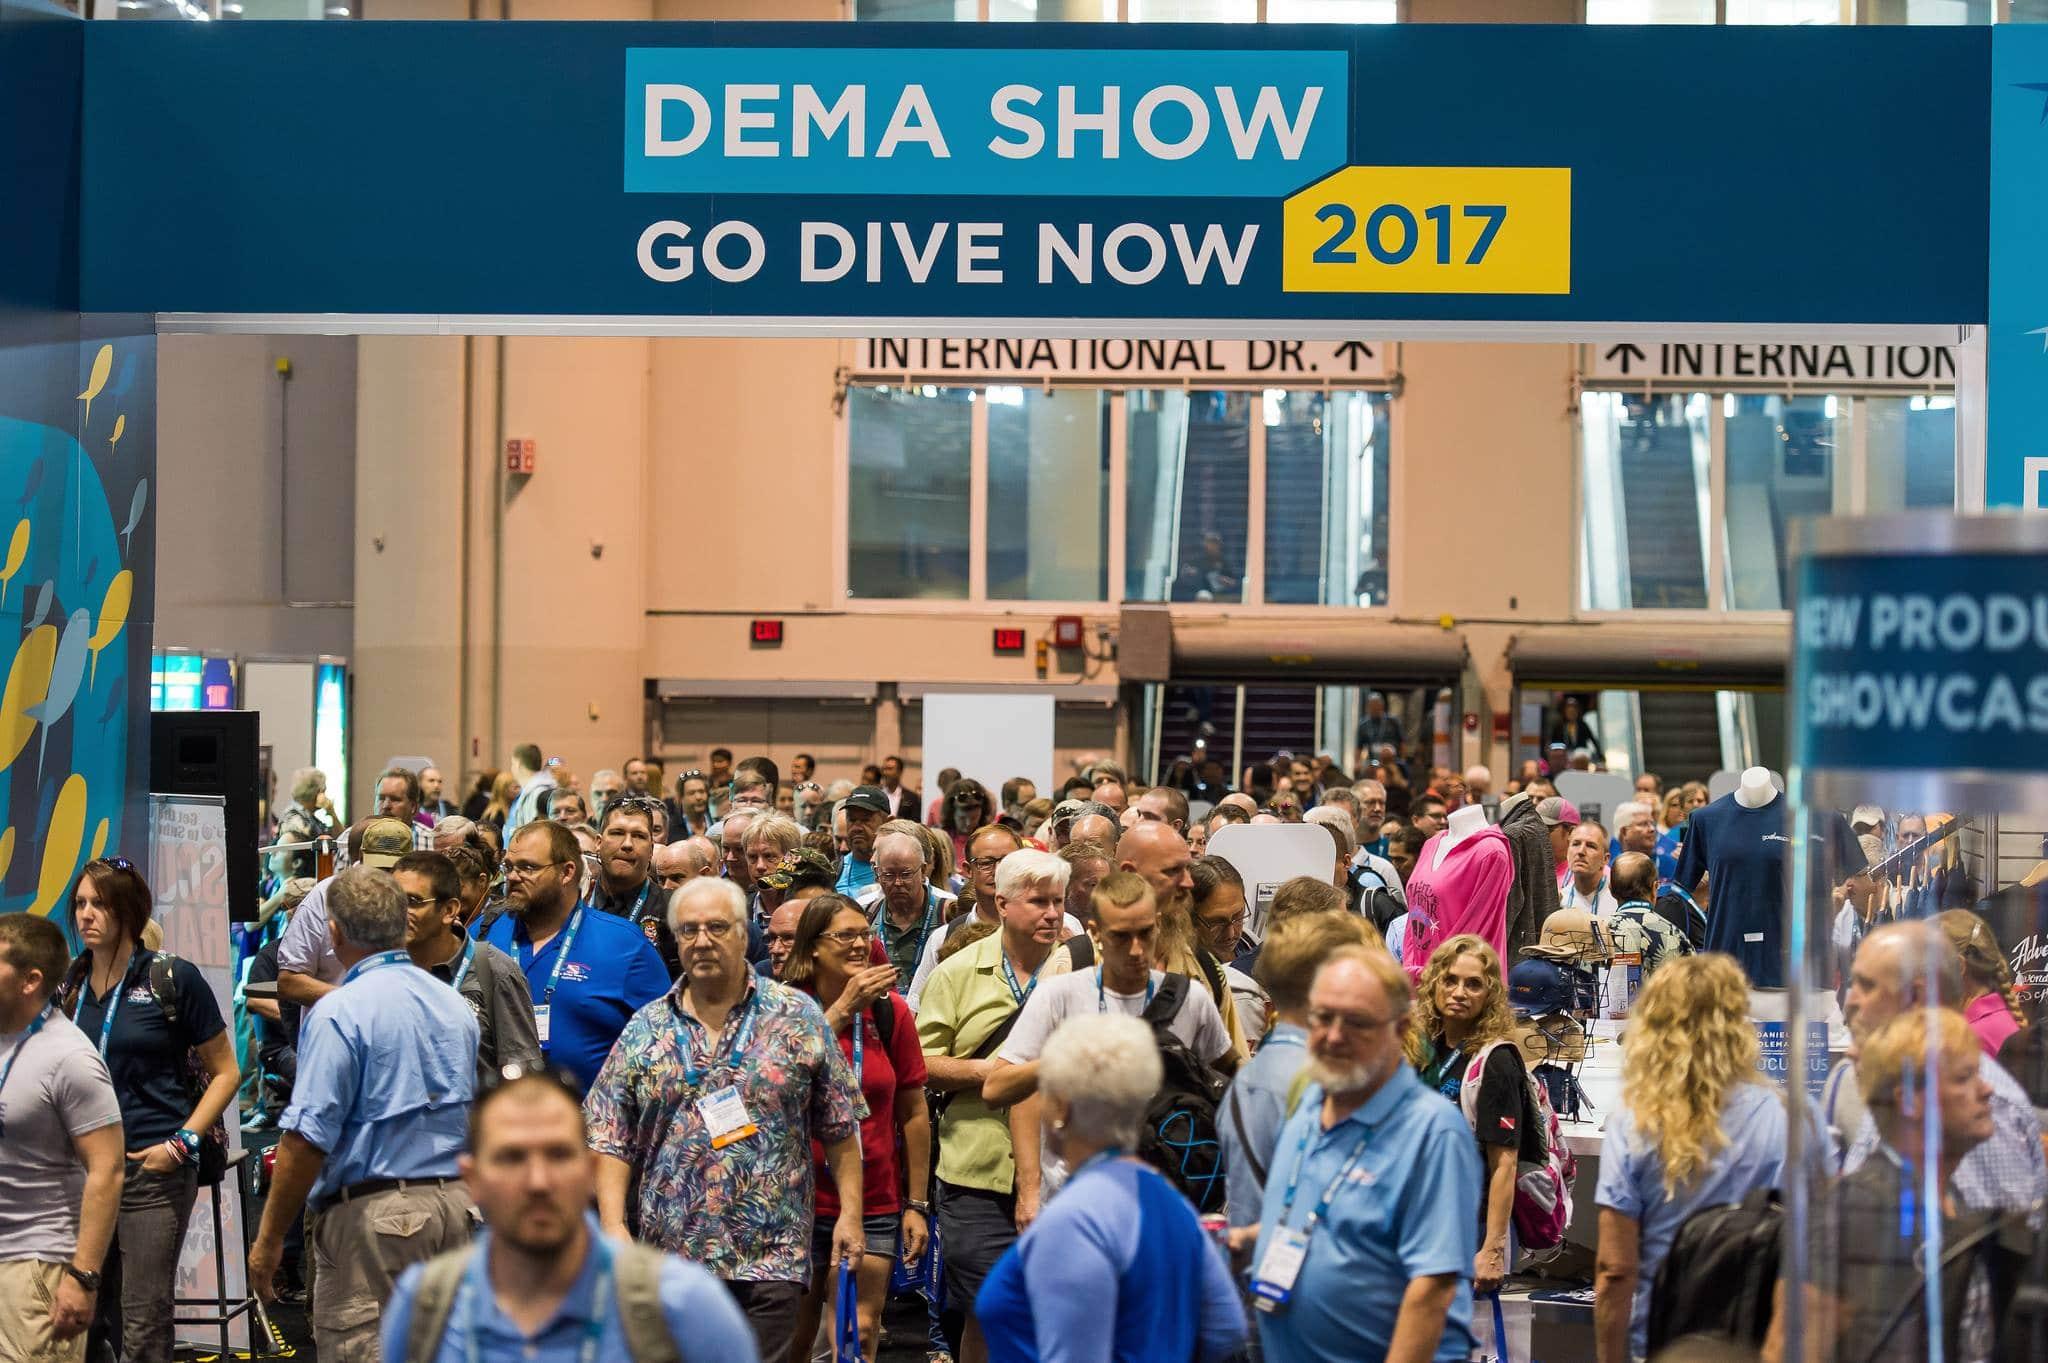 DEMA Show 2017 Kicks Off